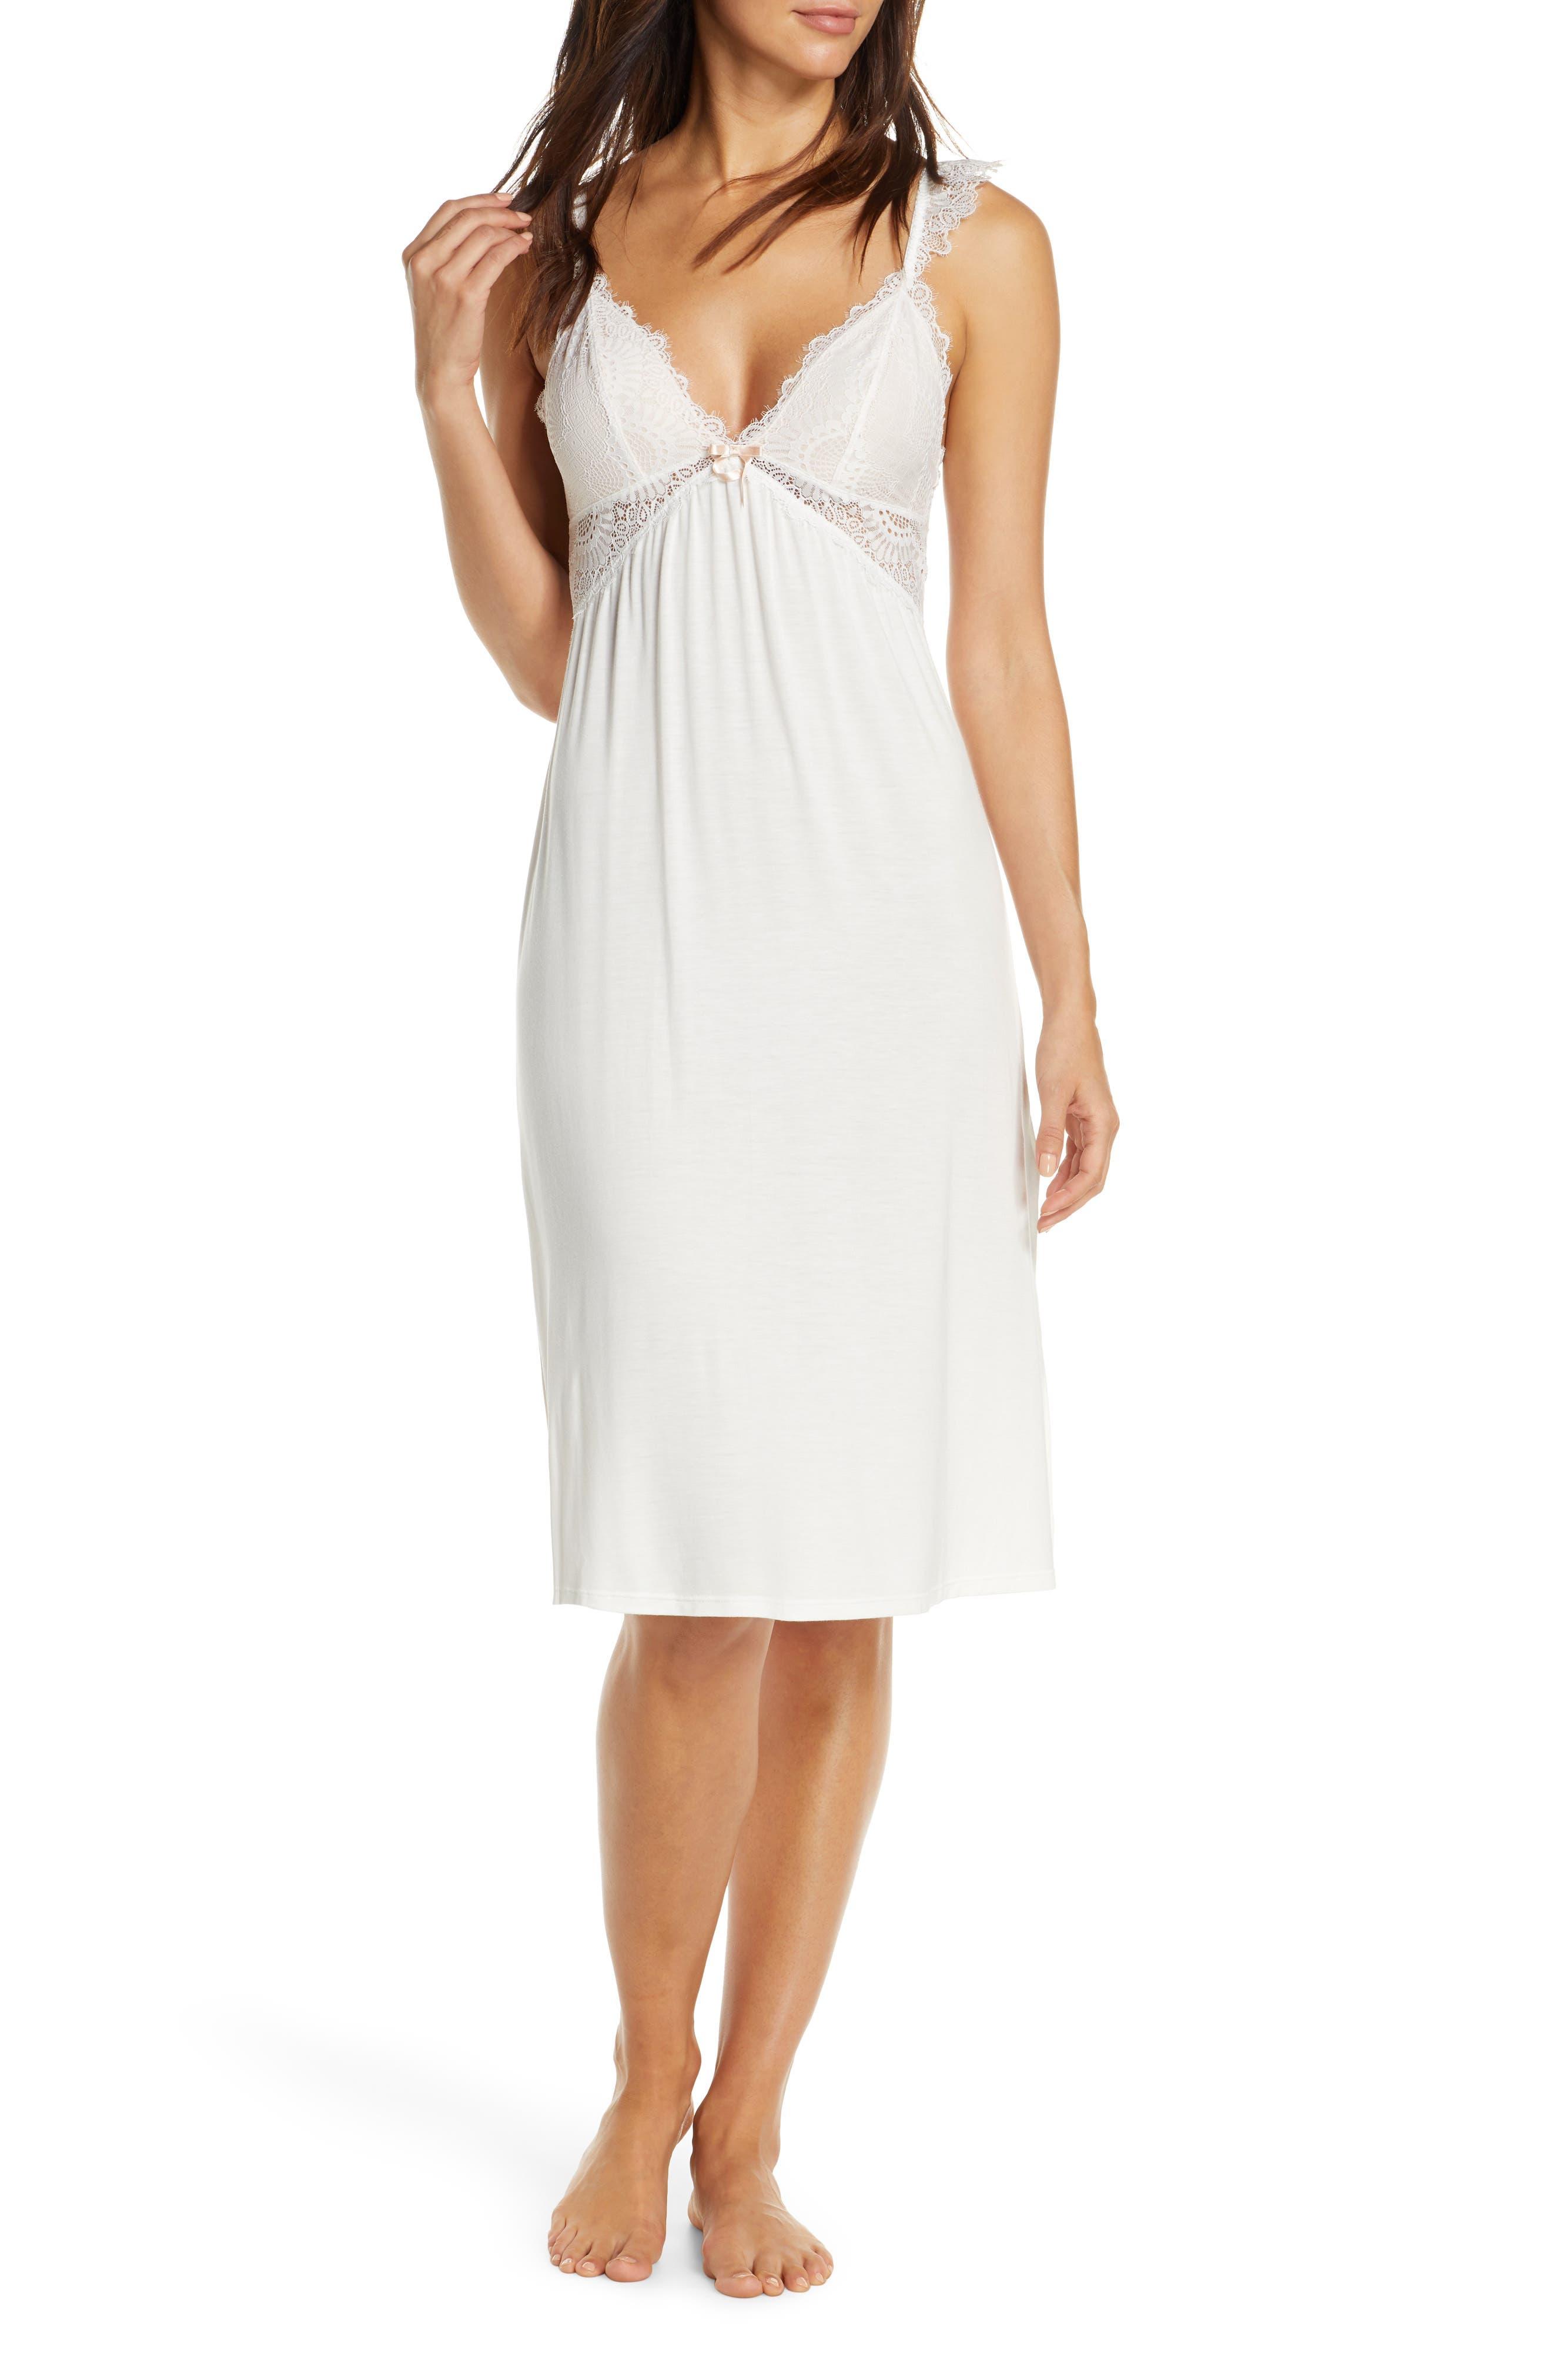 Homebodii Petra Nightgown, White